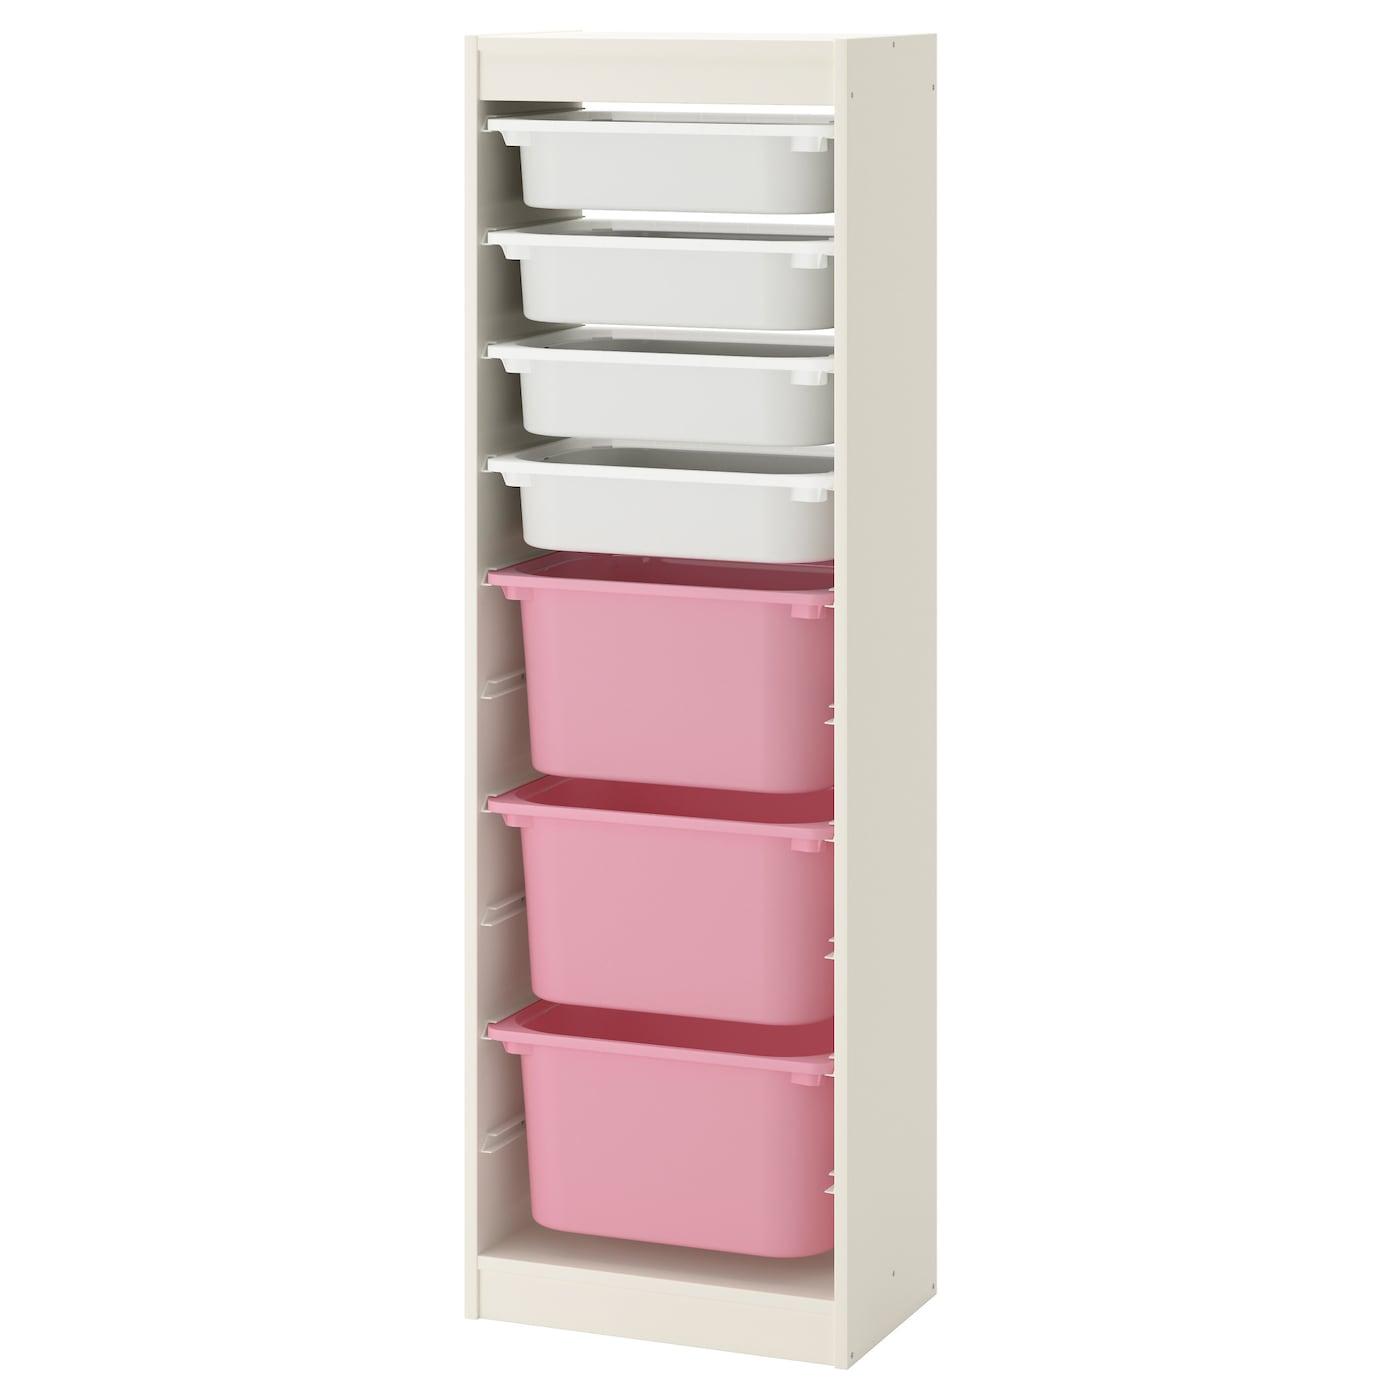 TROFAST Combi rangement+boîtes Blanc/blanc rose 46x30x145 cm - IKEA